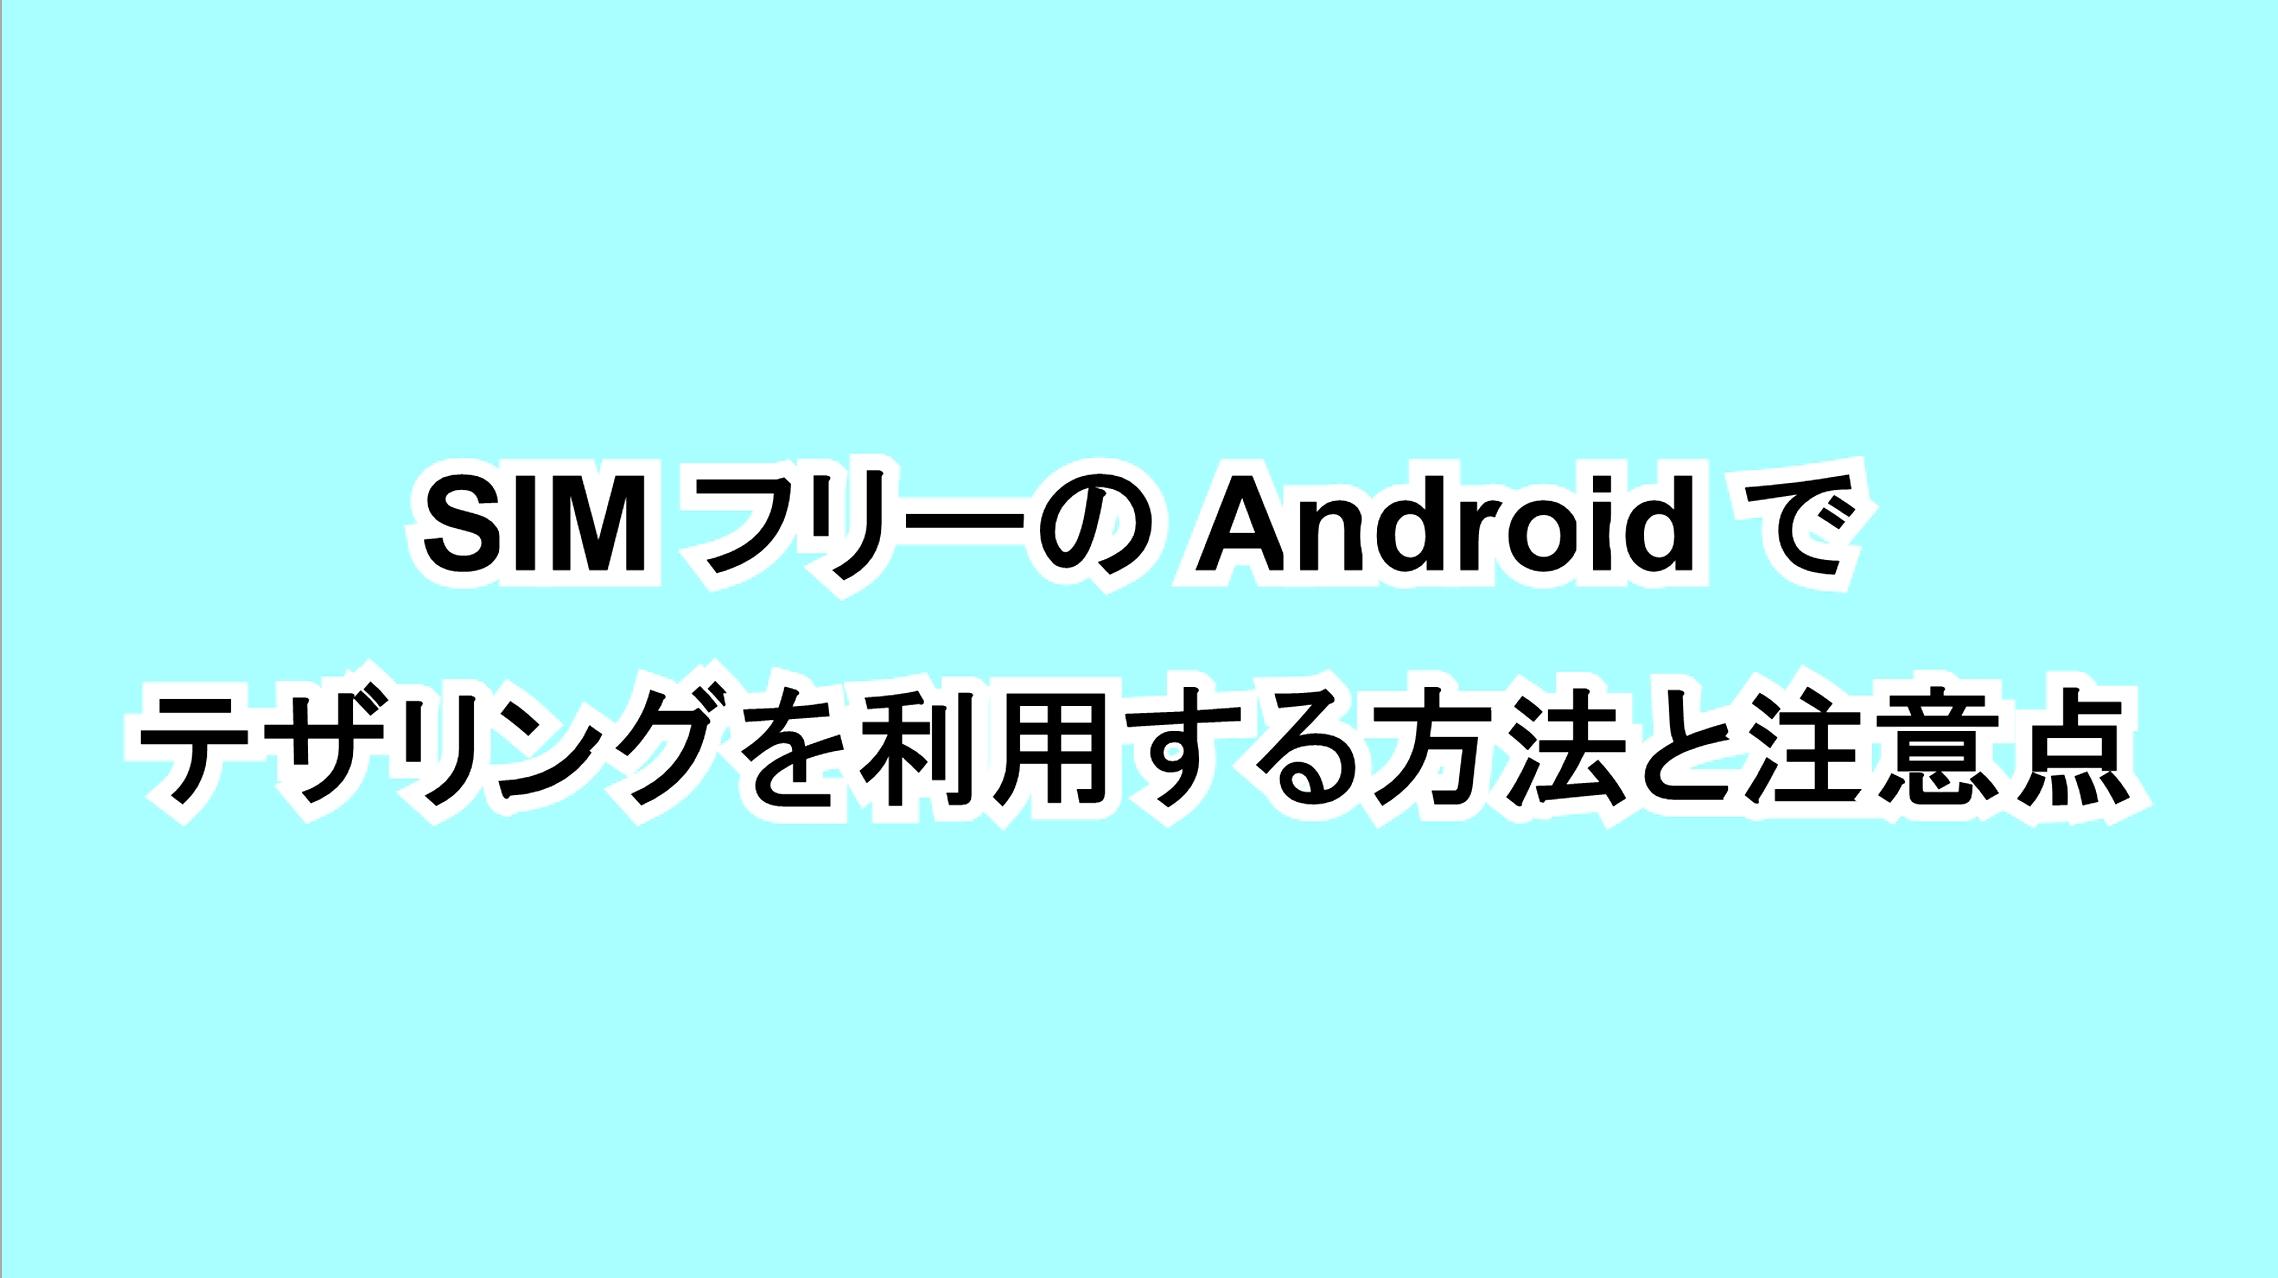 SIM フリーのAndroidでテザリングを利用する方法と注意点